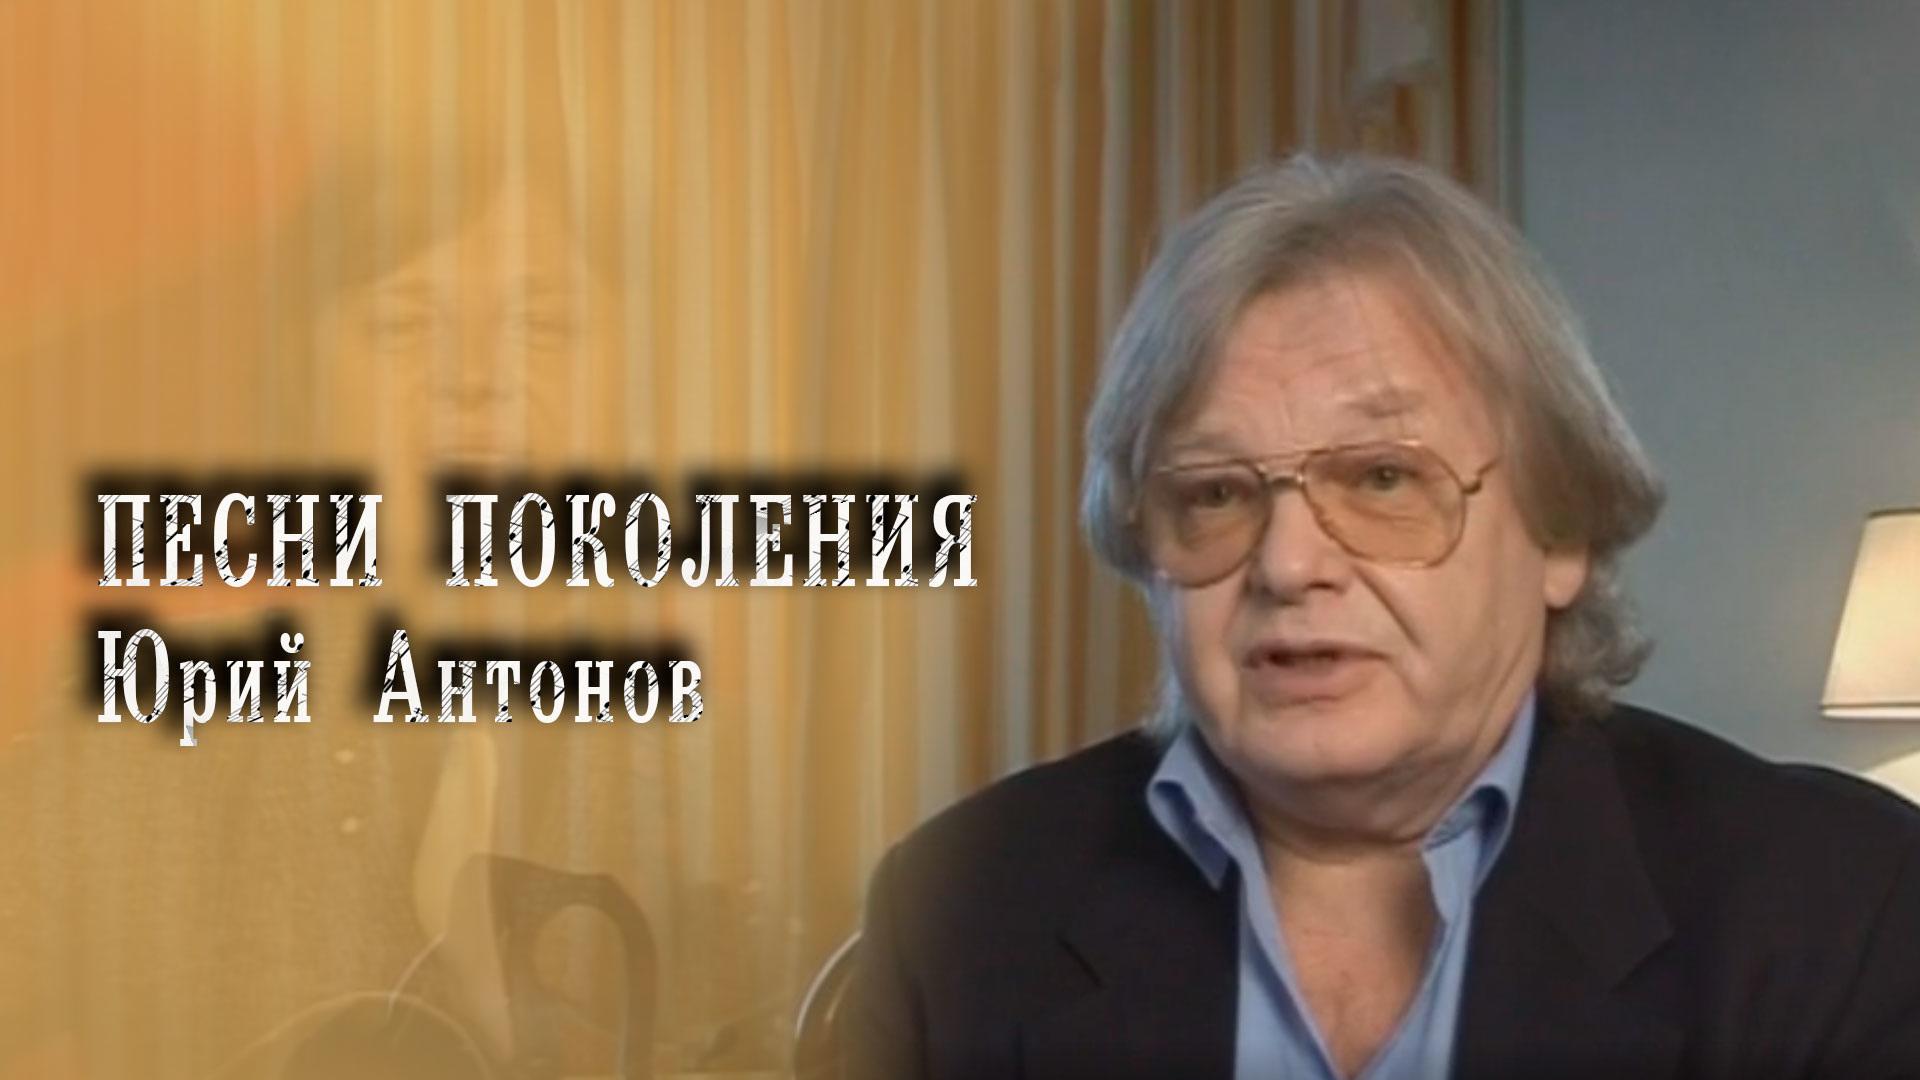 Песни поколений. Юрий Антонов